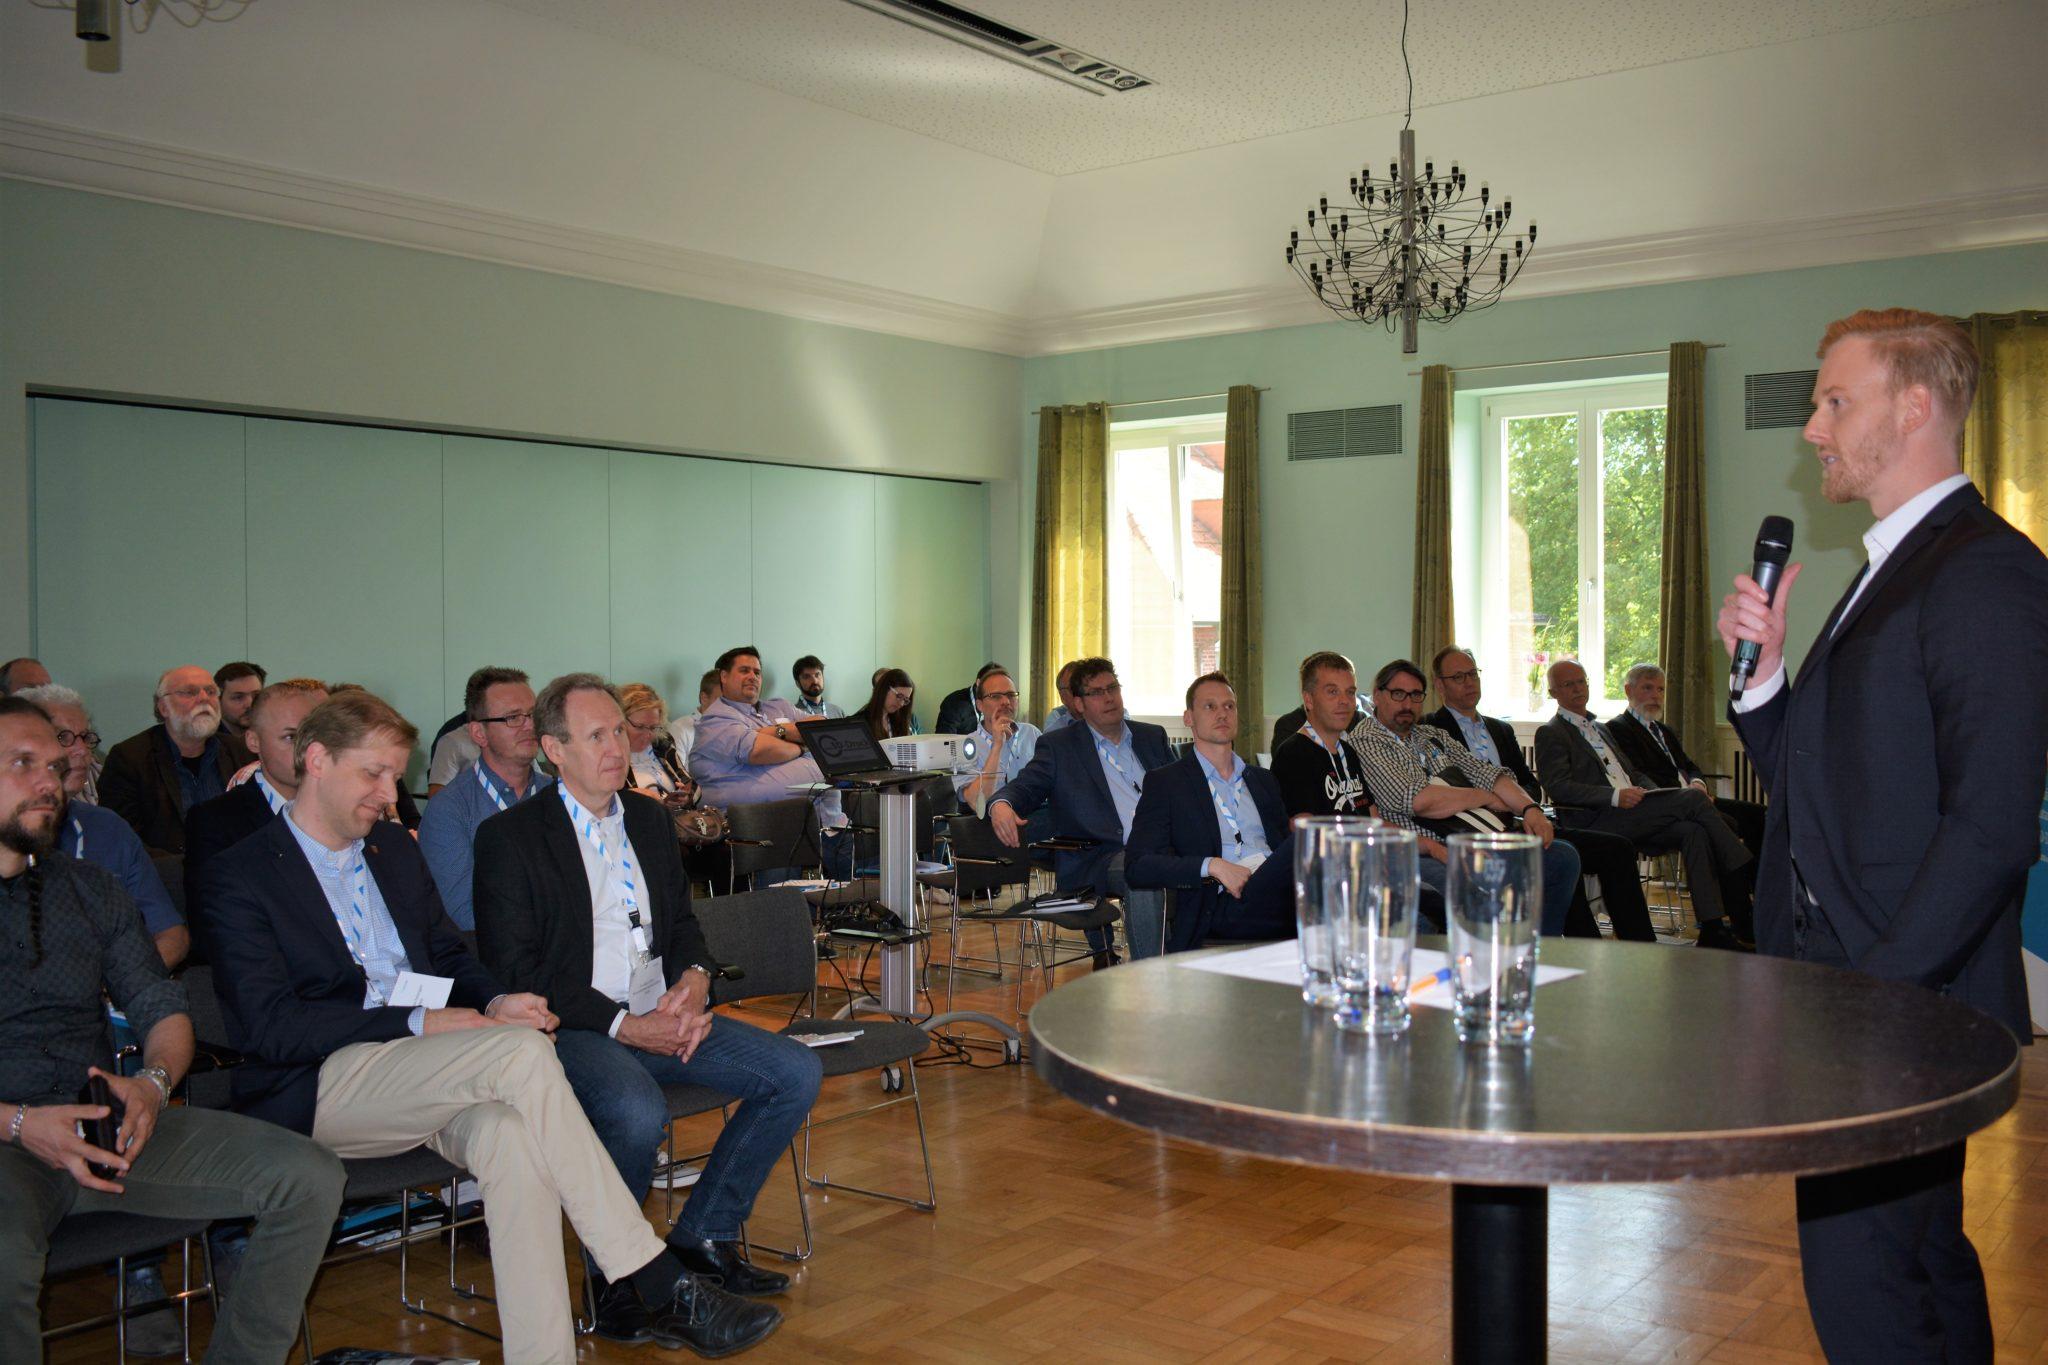 Innovationsforum PUSH.3D-Druck: Zweitägiger Kongress zum Thema 3D-Druck beendet